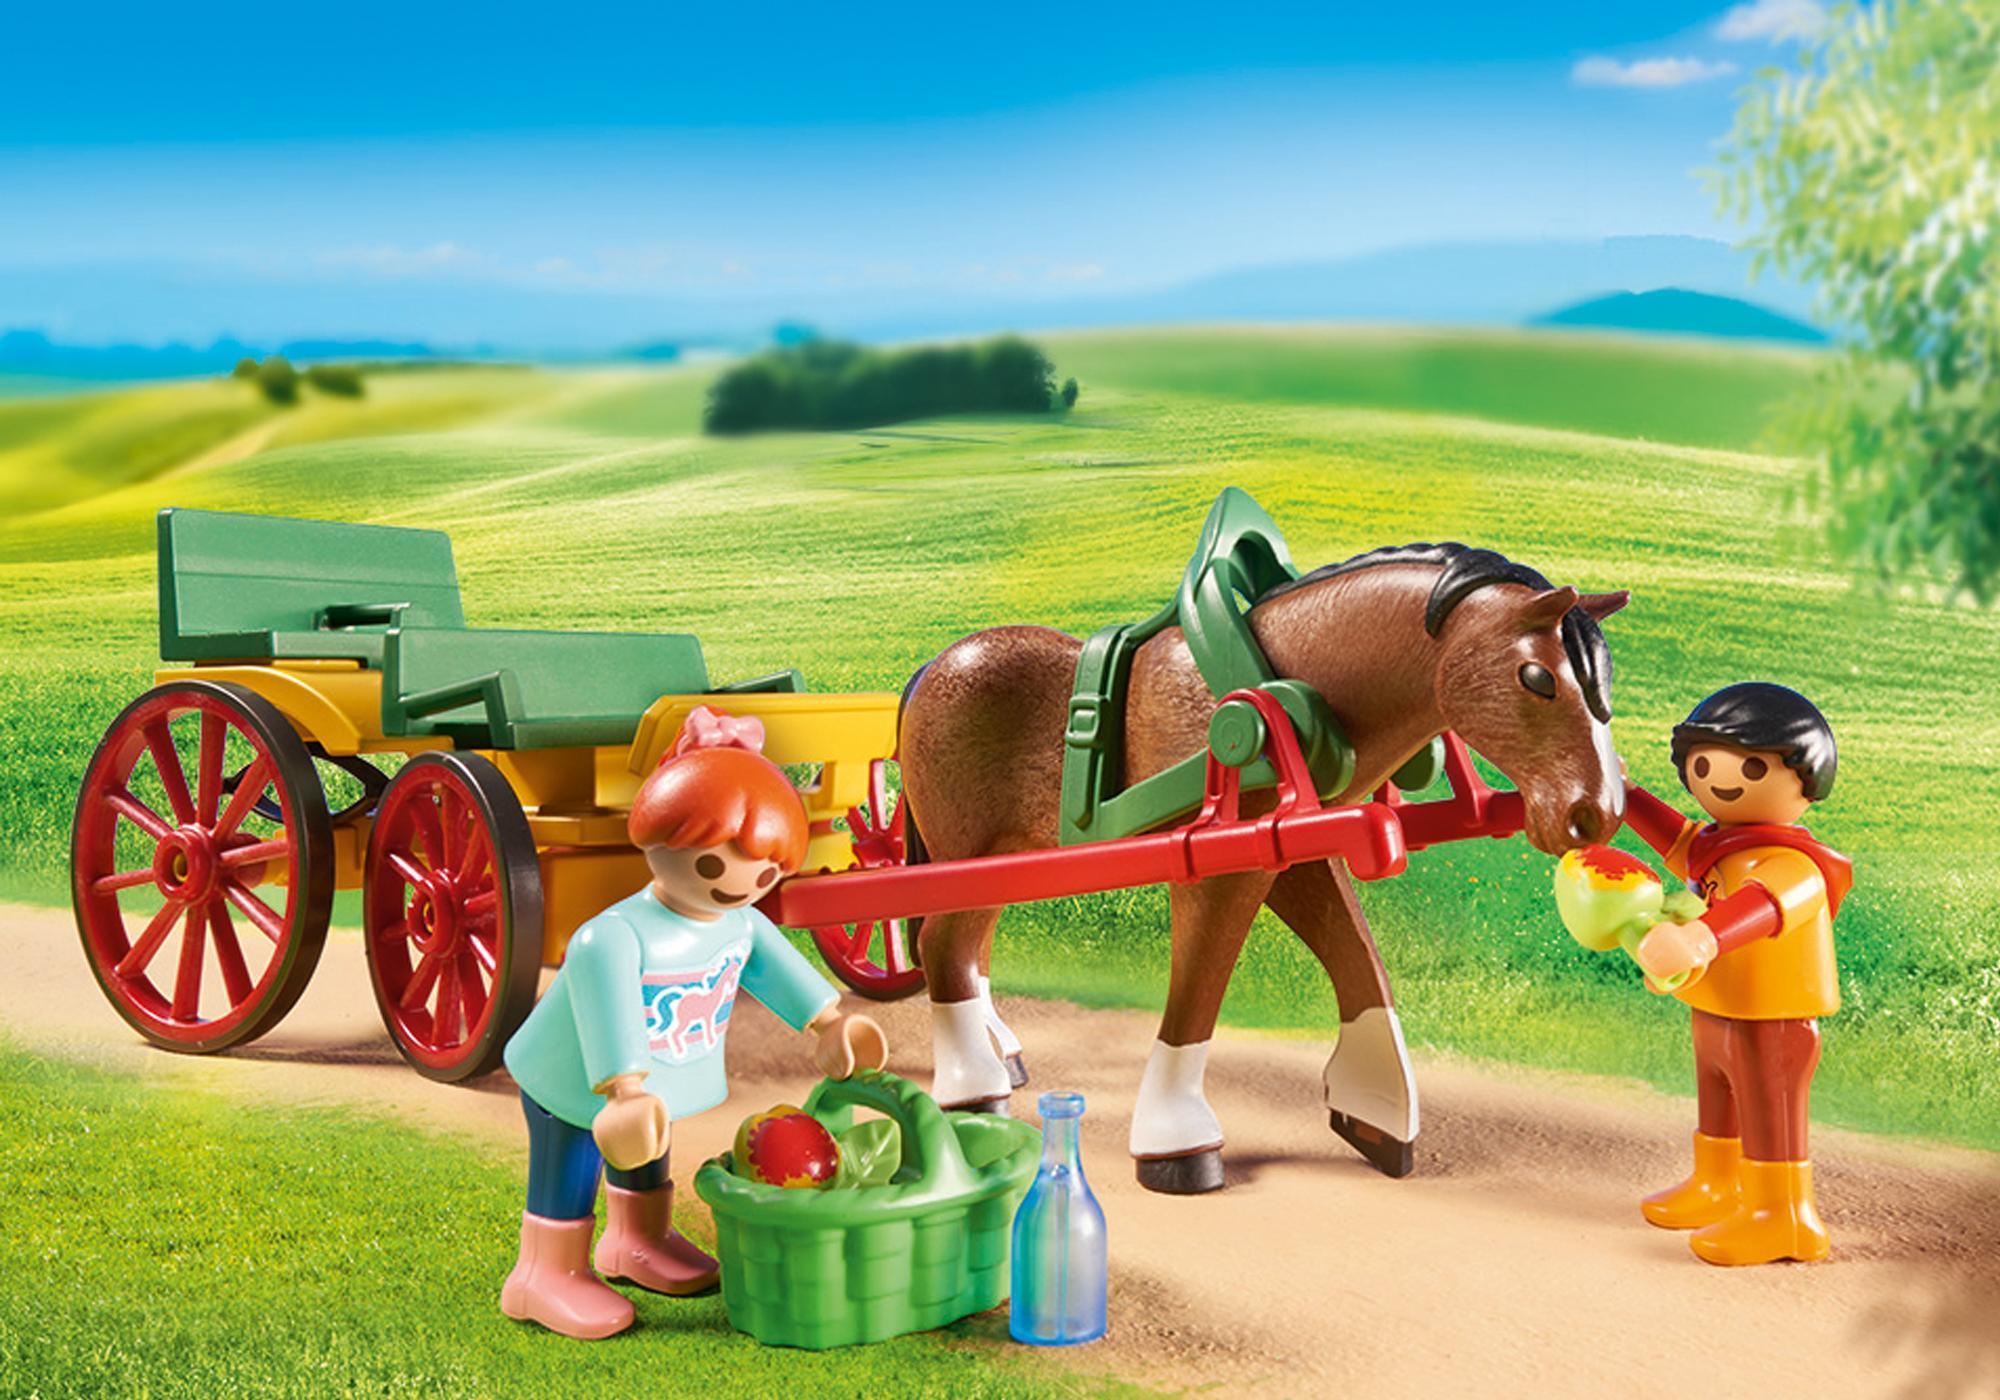 http://media.playmobil.com/i/playmobil/6932_product_extra1/Horse-Drawn Wagon